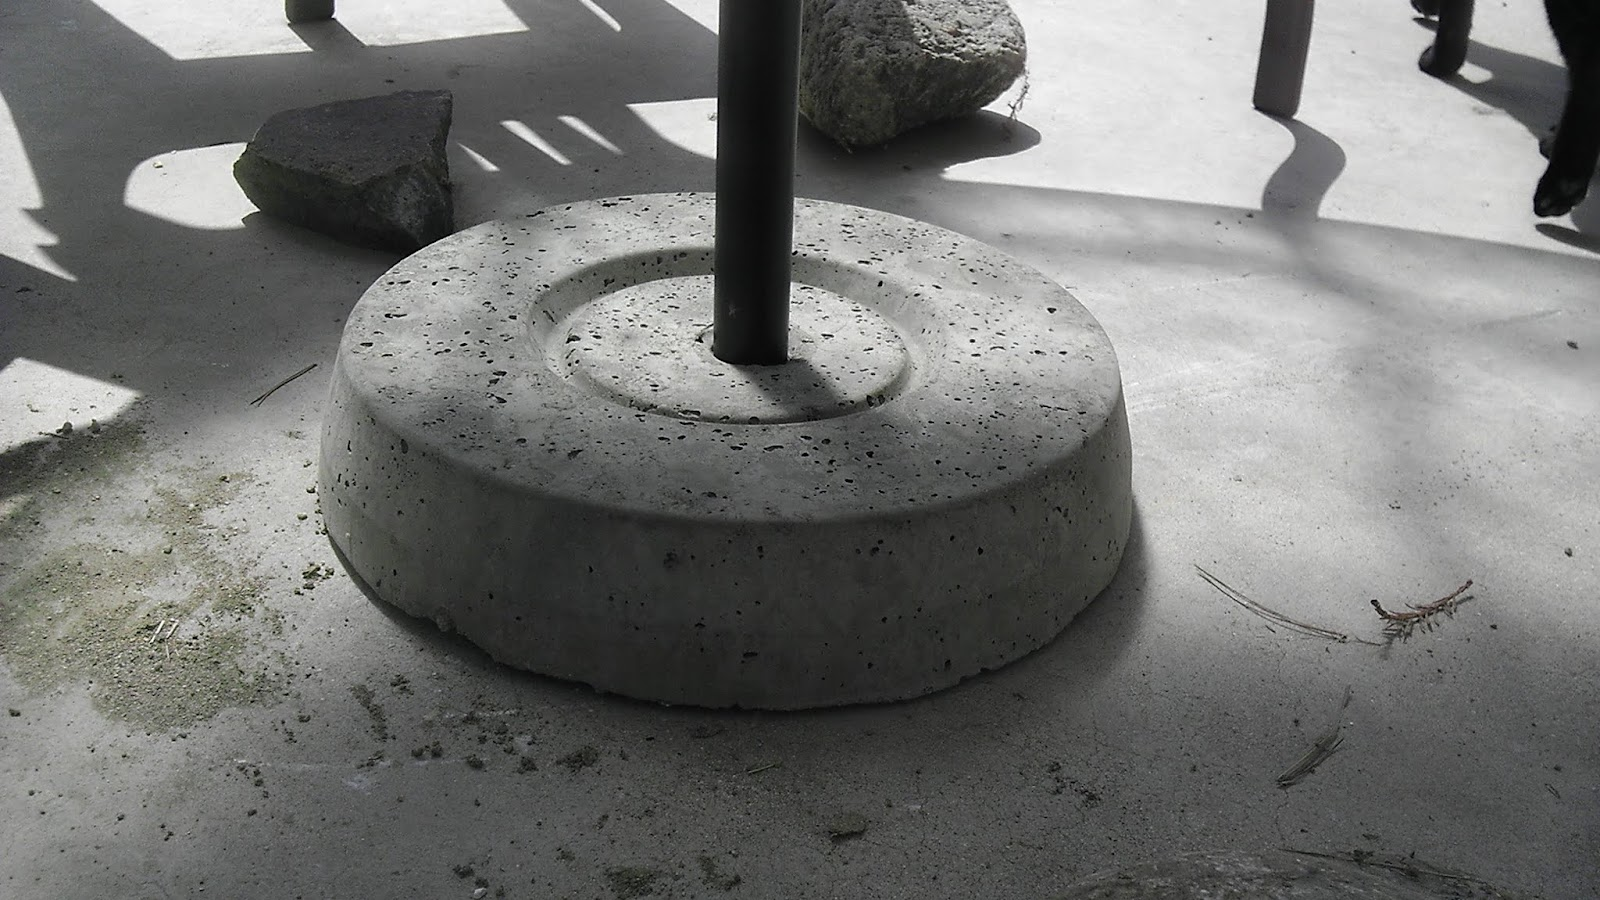 christina and ted buy a house diy concrete umbrella stand. Black Bedroom Furniture Sets. Home Design Ideas